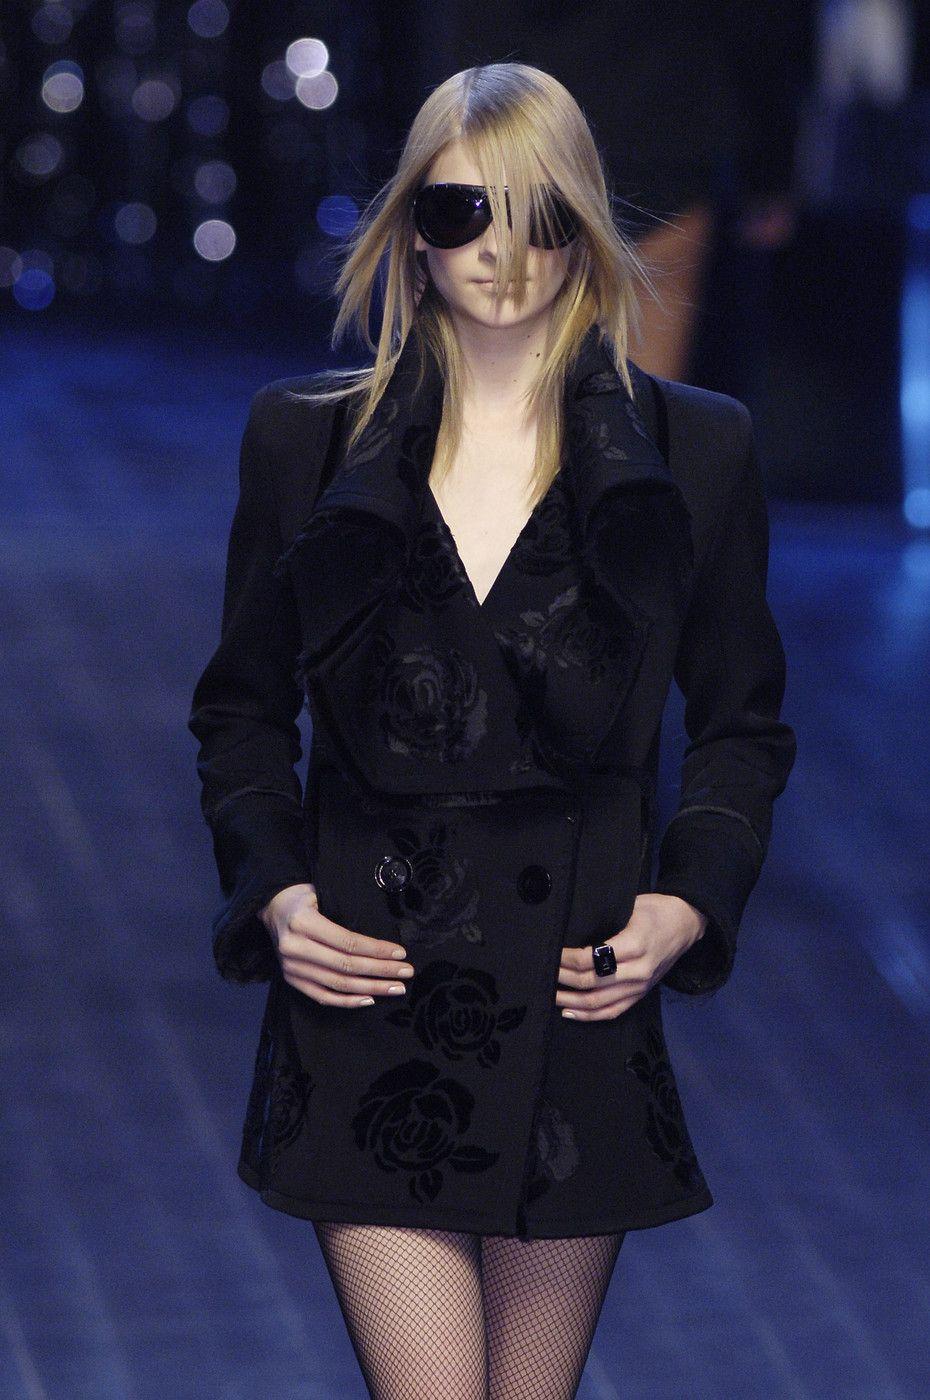 156 photos of Christian Dior at Paris Fashion Week Fall 2005.